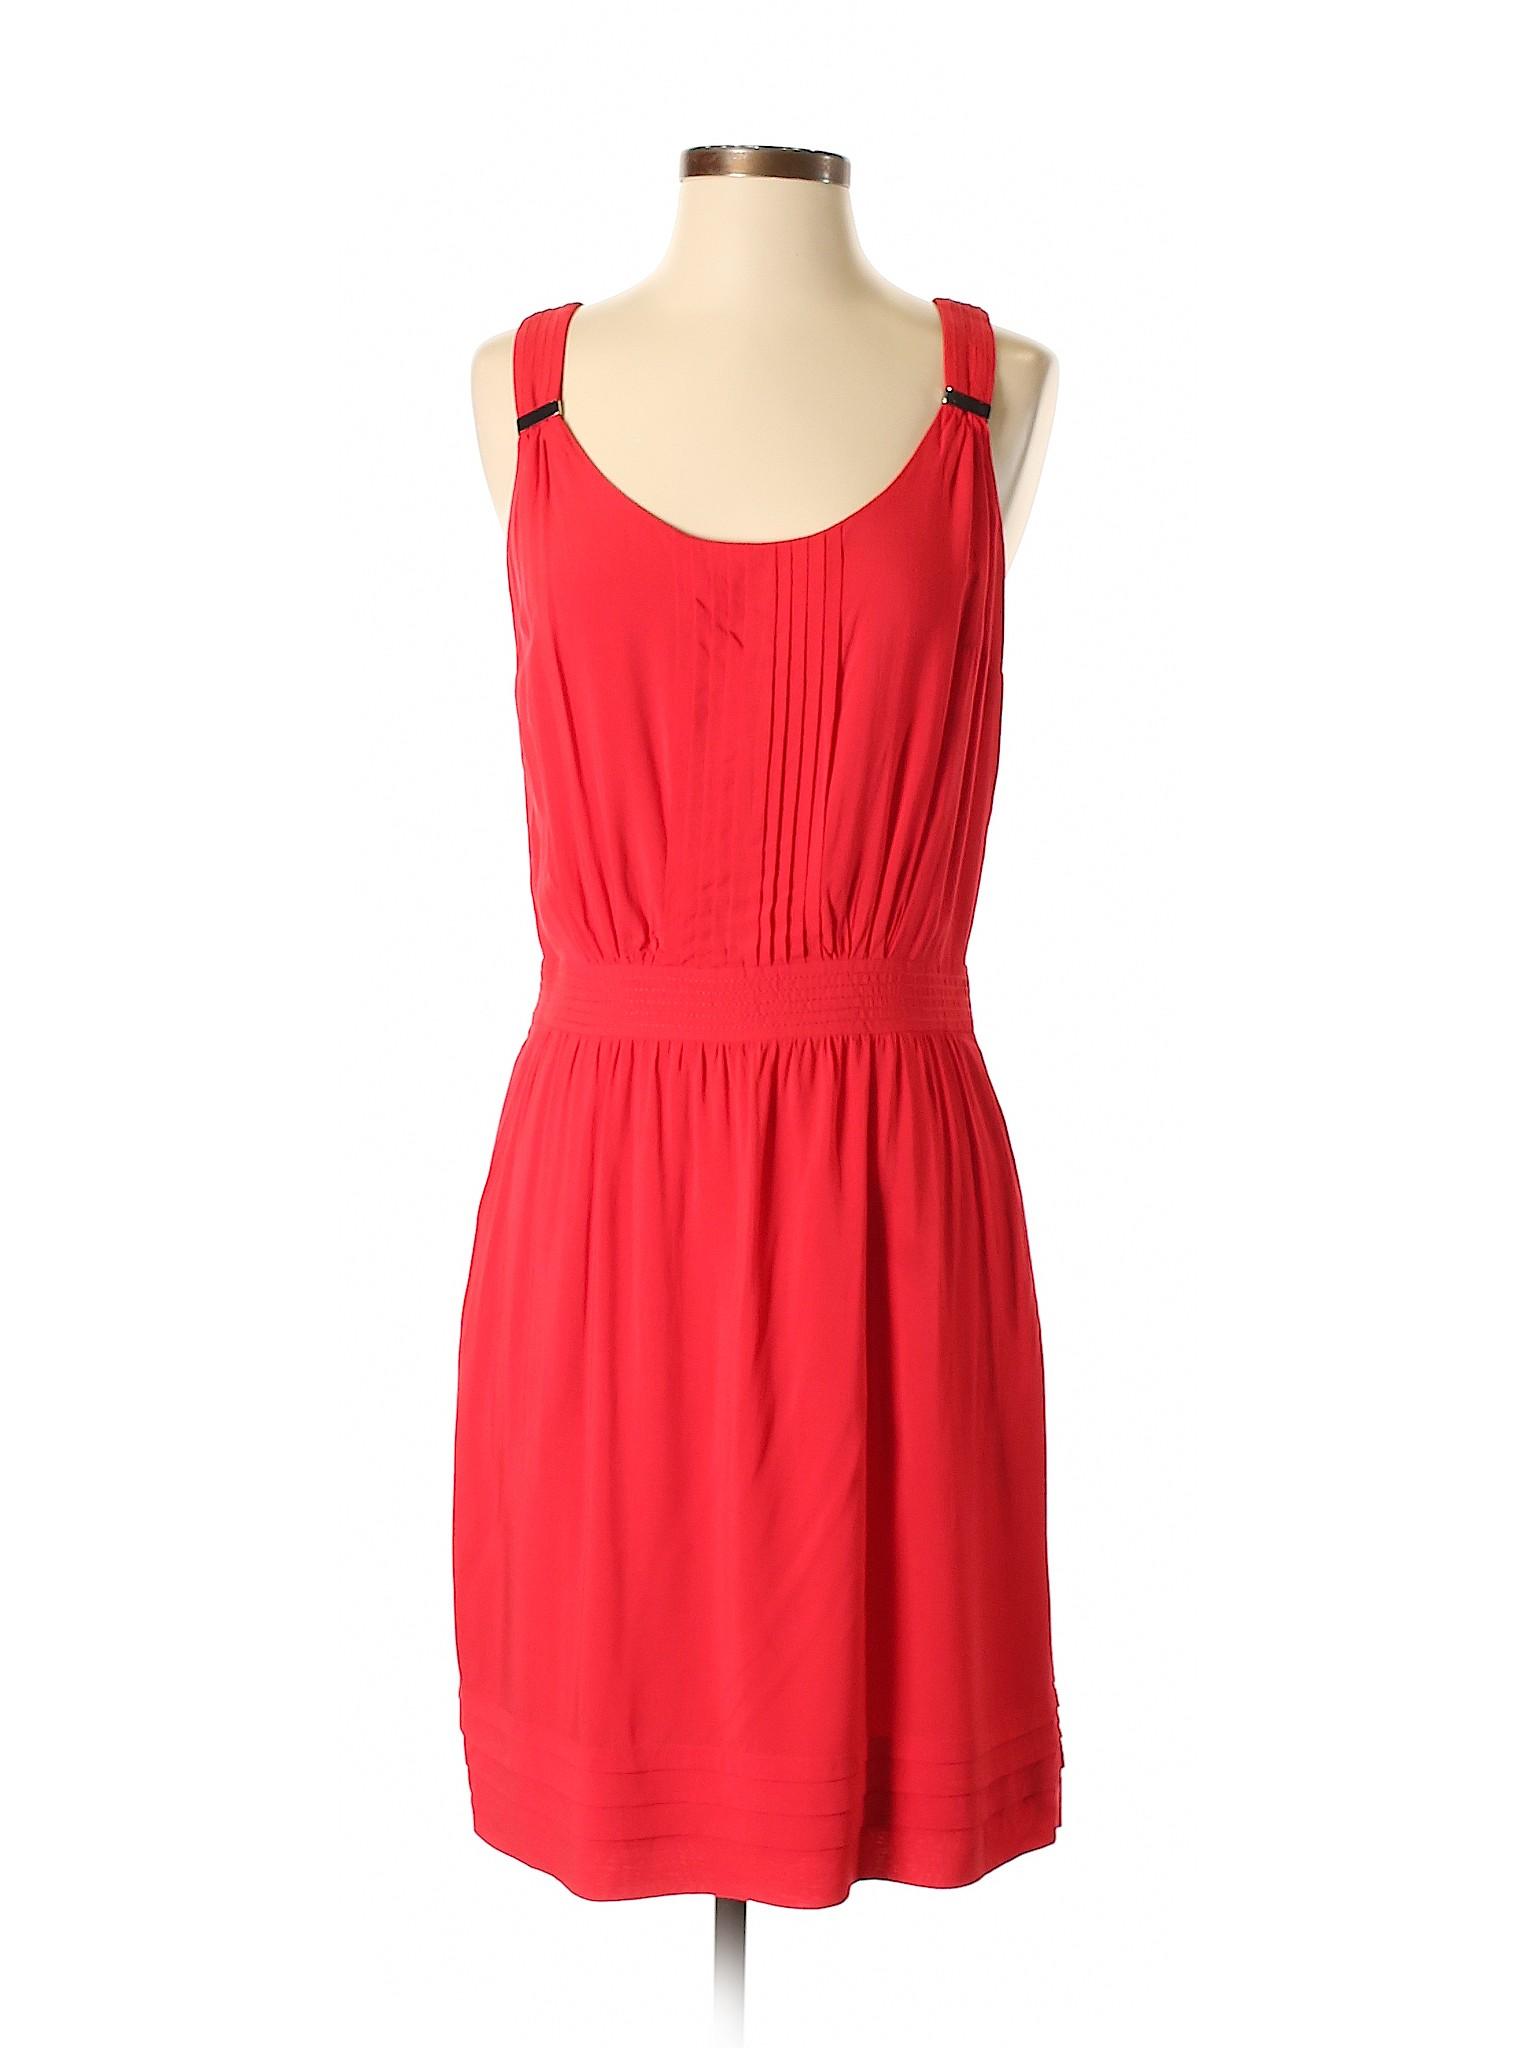 Casual Dress White House winter Black Market Boutique CBwYqXF